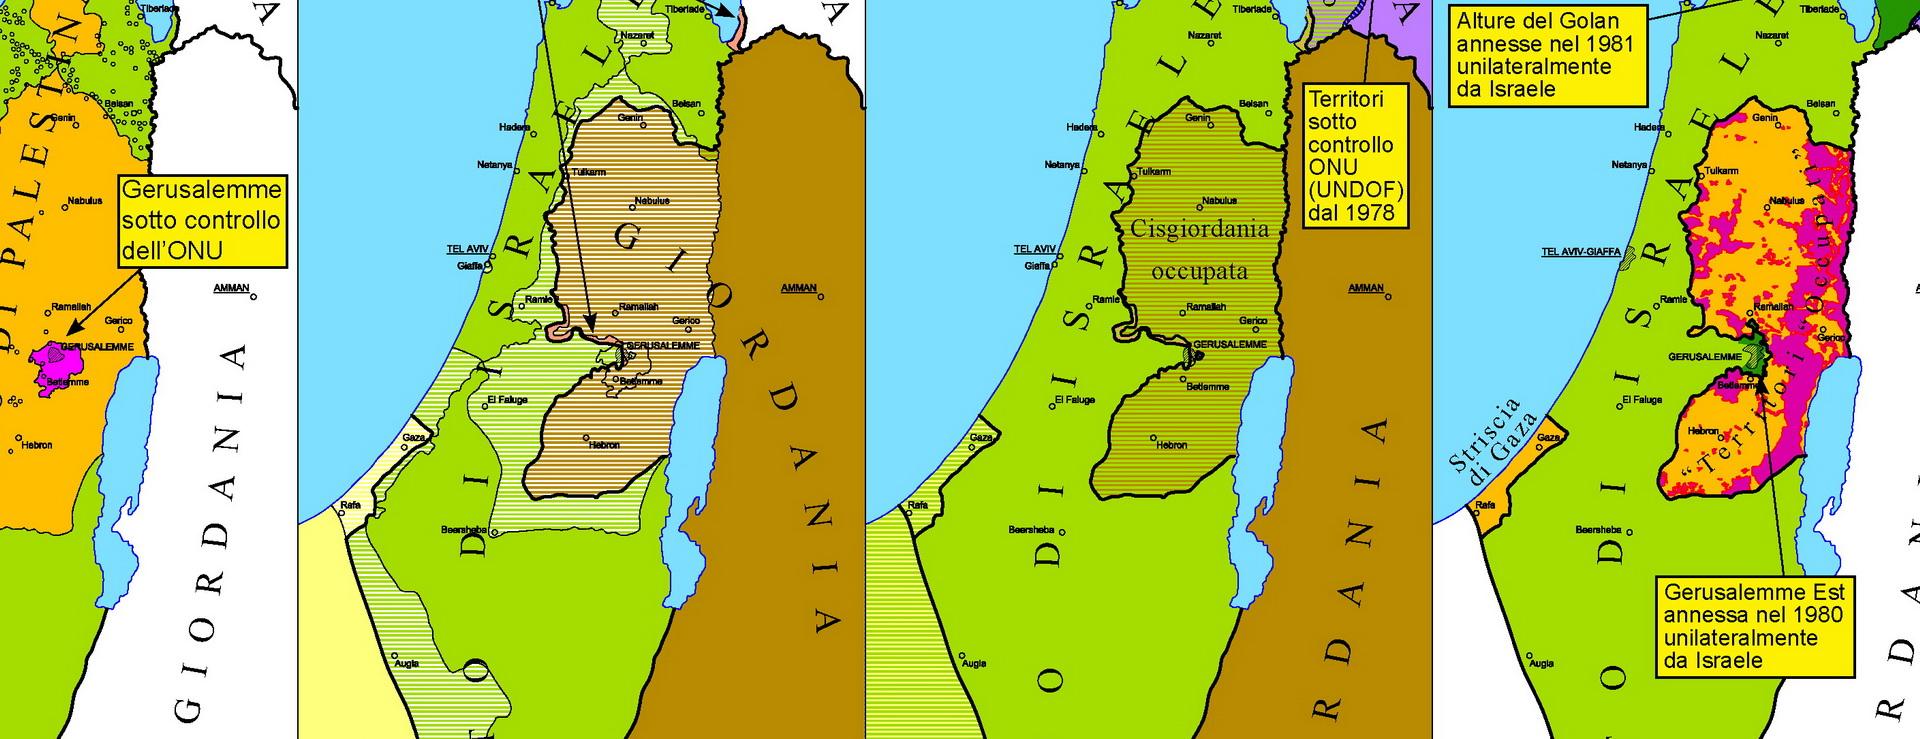 Israele Palestina Cartina.Israele Palestina Una Ferita Che Sanguina Da 100 Anni Nuova Storia